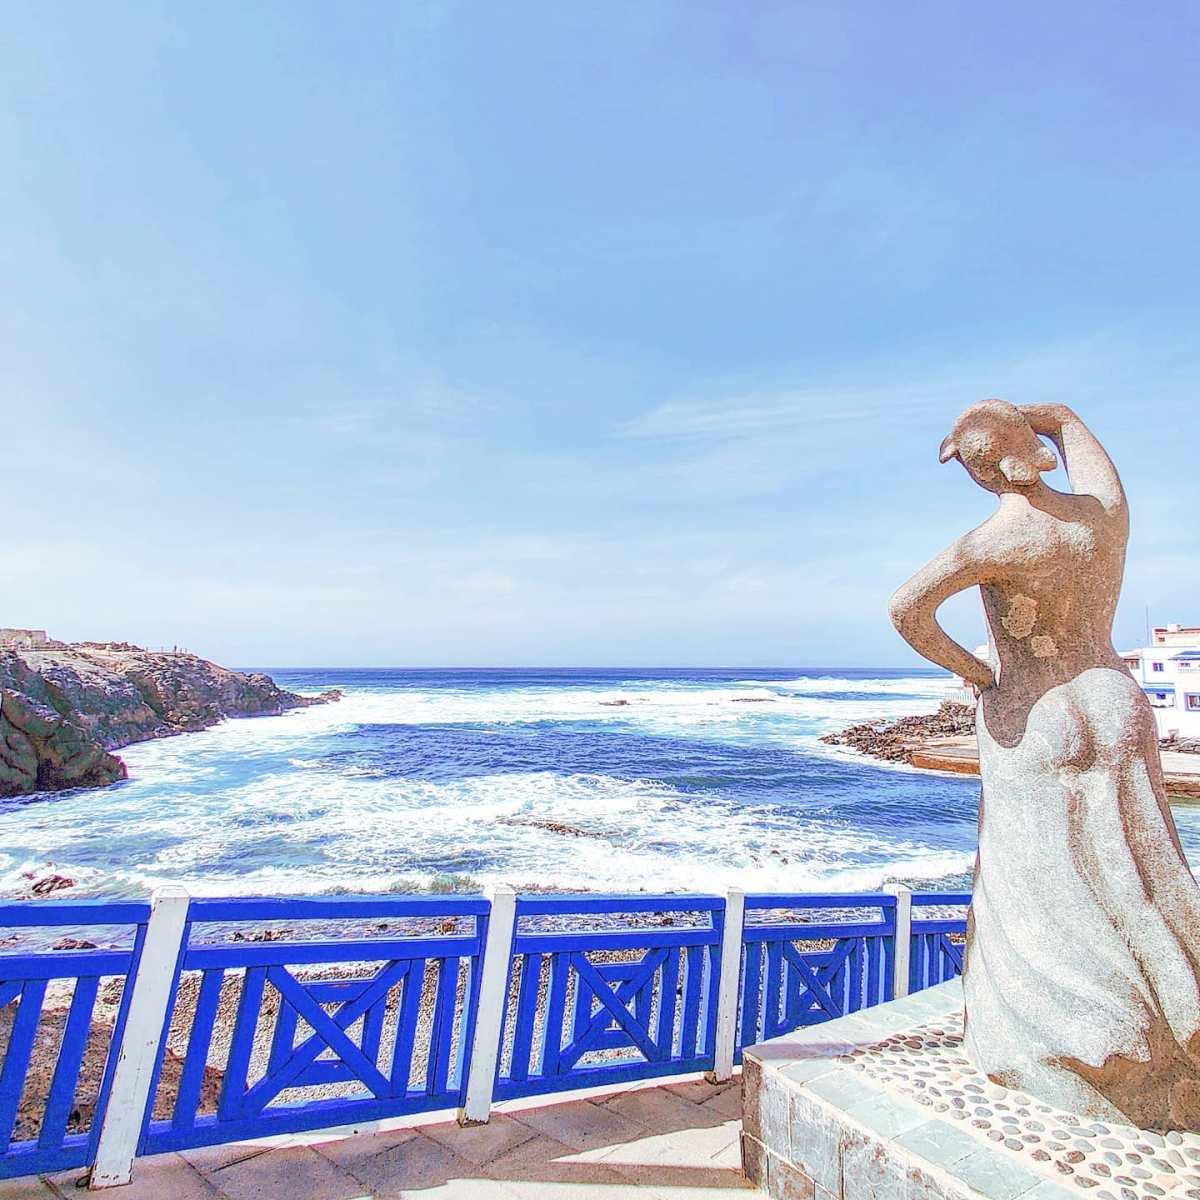 Looking at the sea 🤙El Cotilio, Fuerteventura 2020#elcotillo #fuerteventura #canaryislands #tbt#traveller #travelling #naturephotography #canaryislands #seaside #travel #travelgram #traveling #scolpture #travelphotography #naturelovers #traveler #beach #beachlife #seascape #nature #sea #travelblogger #sealife #breeze